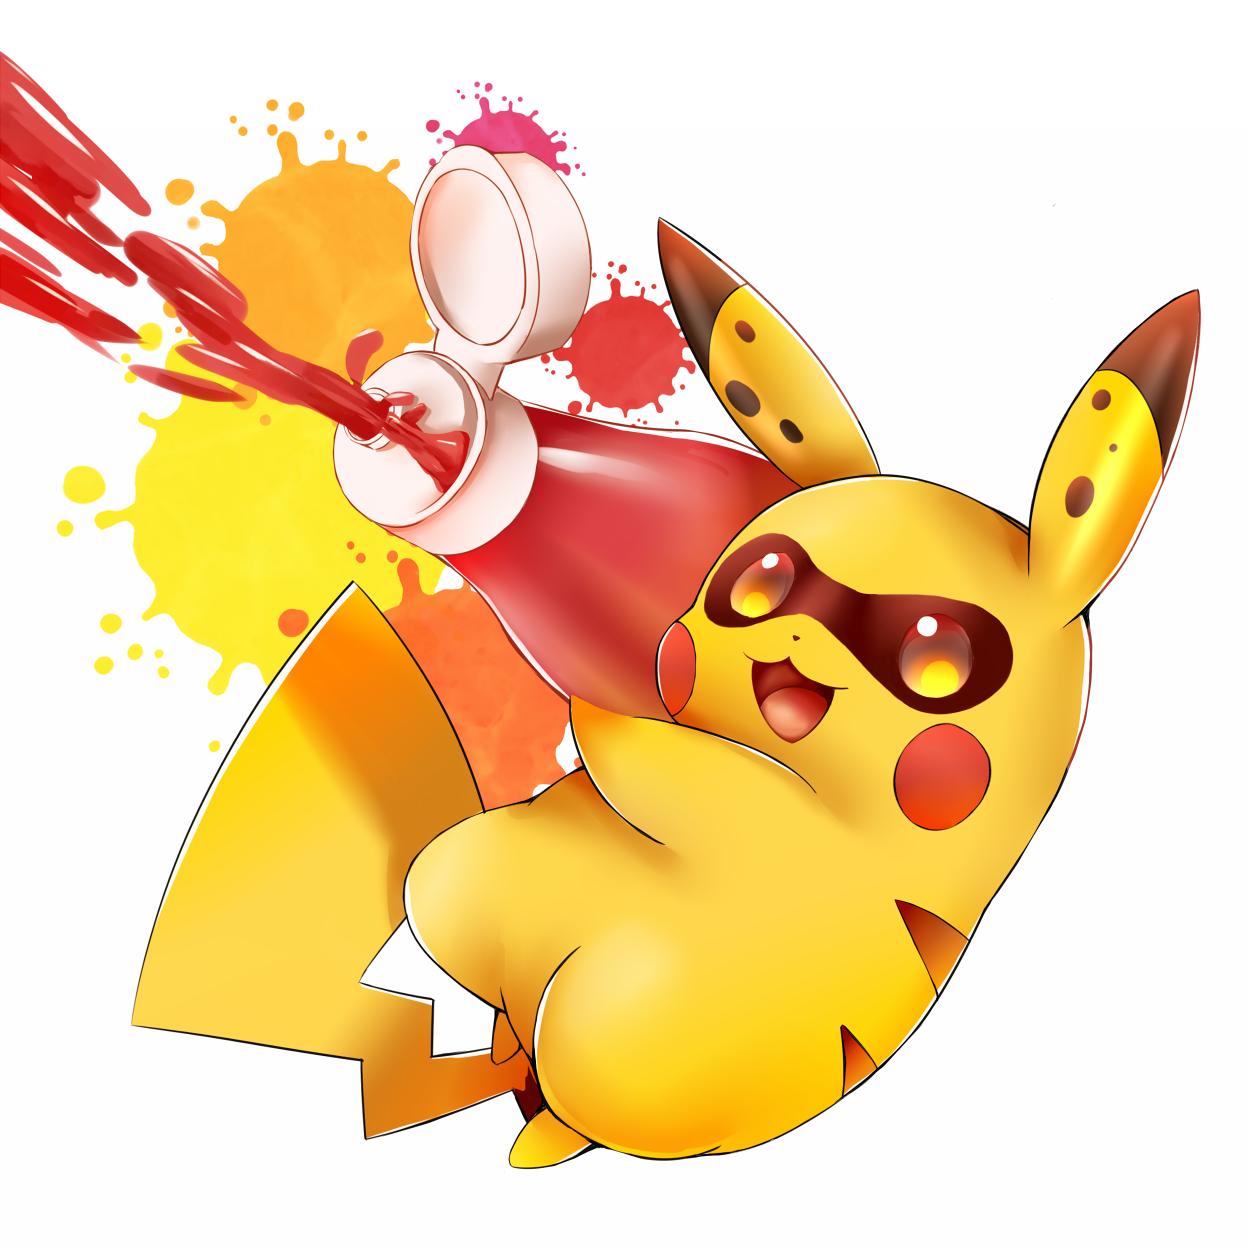 Pikachu inkling splatoon know your meme - Pikachu kawaii ...